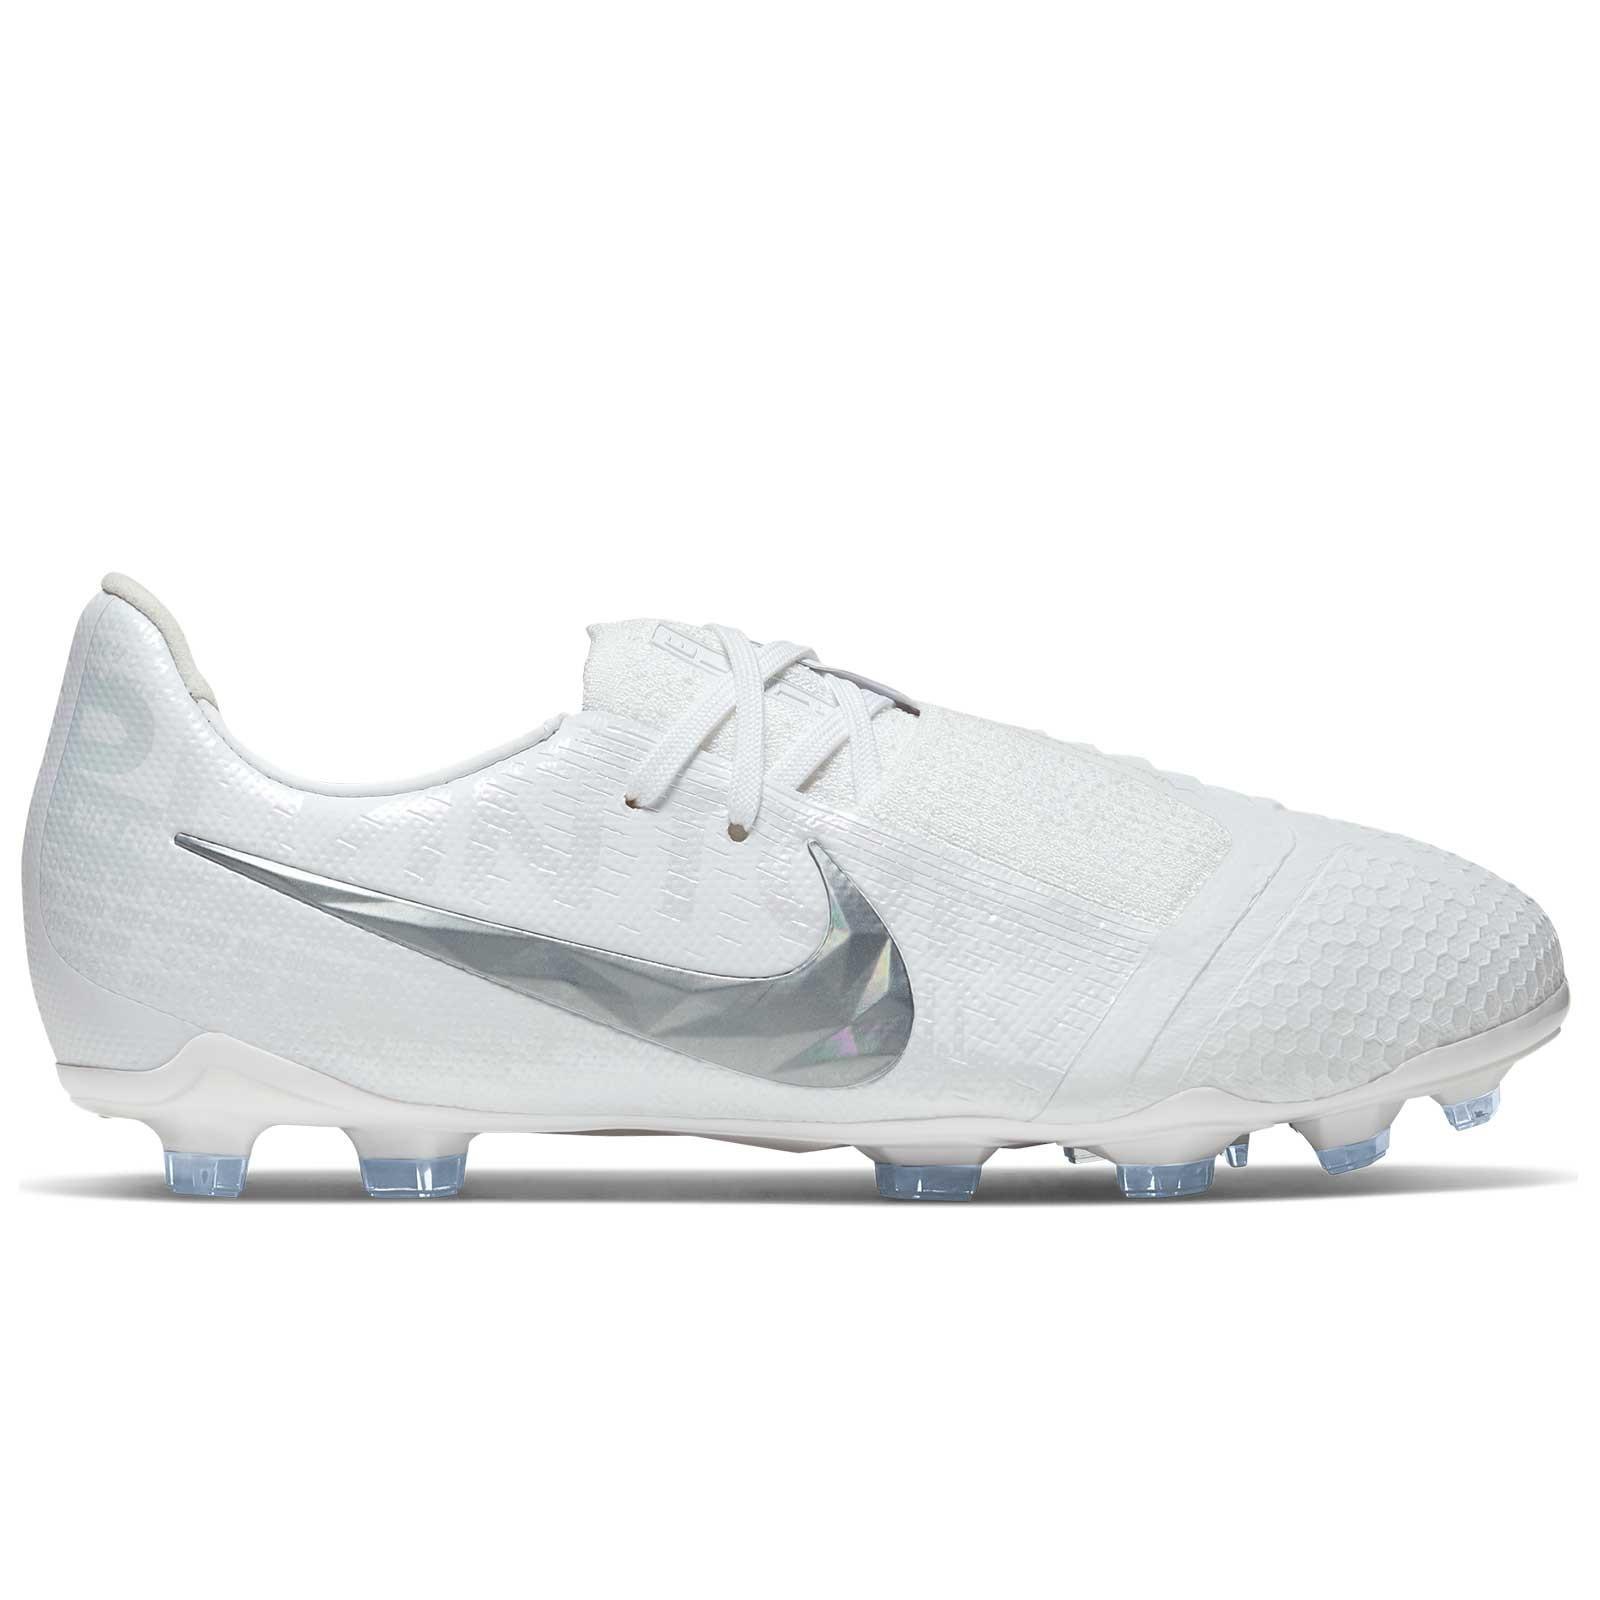 Buty Piłkarskie Nike Mercurial Superfly V FG Bianco Sklep Buty Korki